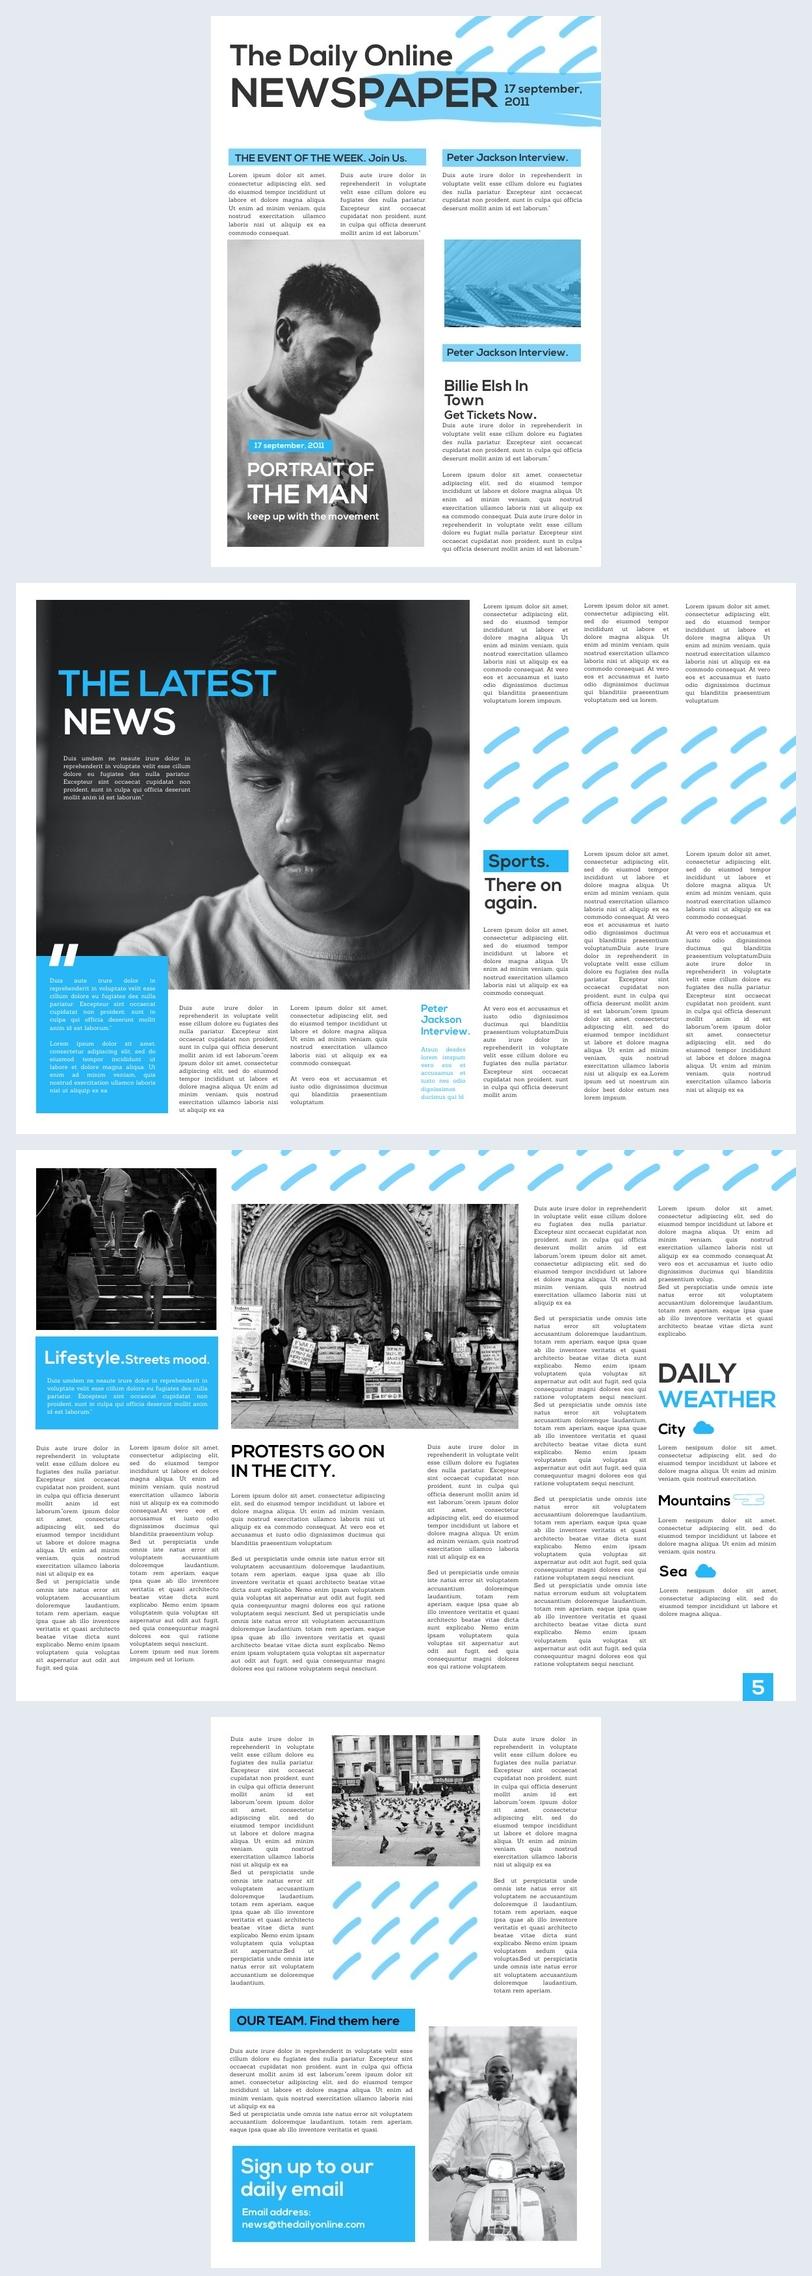 Exemple de design de journal en ligne